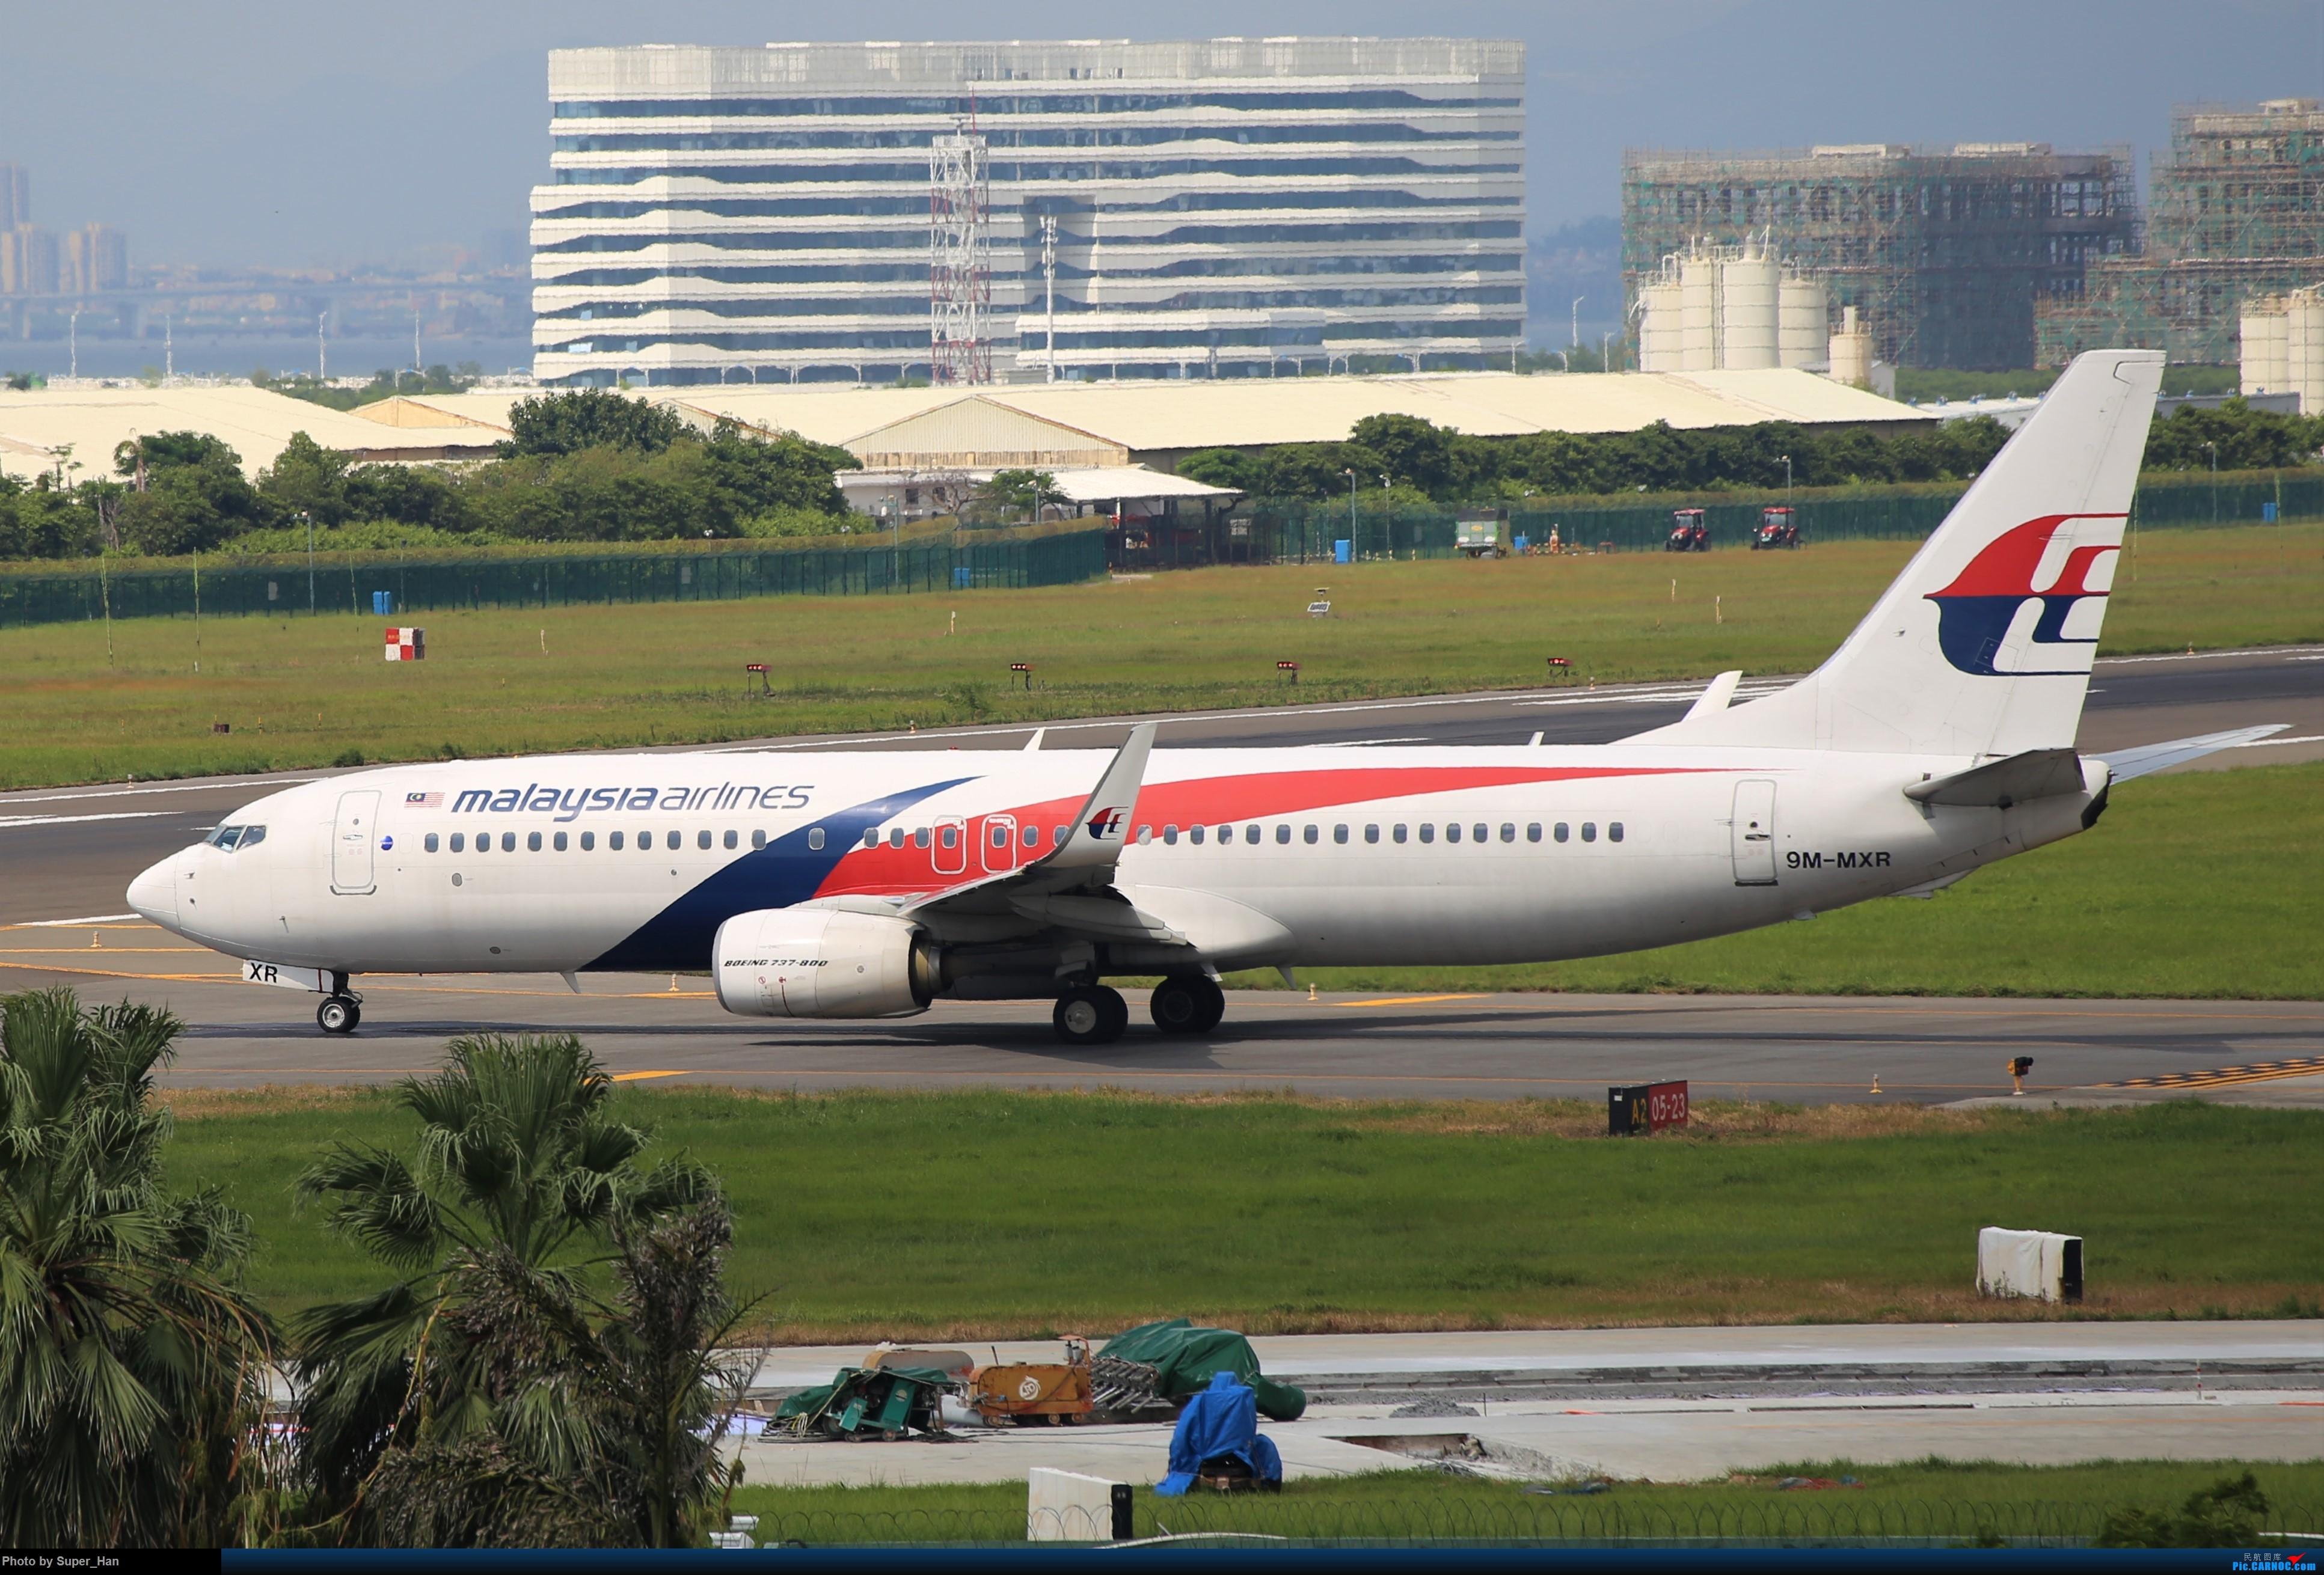 Re:[原创]0831初访XMN BOEING 737-800 9M-MXR 中国厦门高崎国际机场